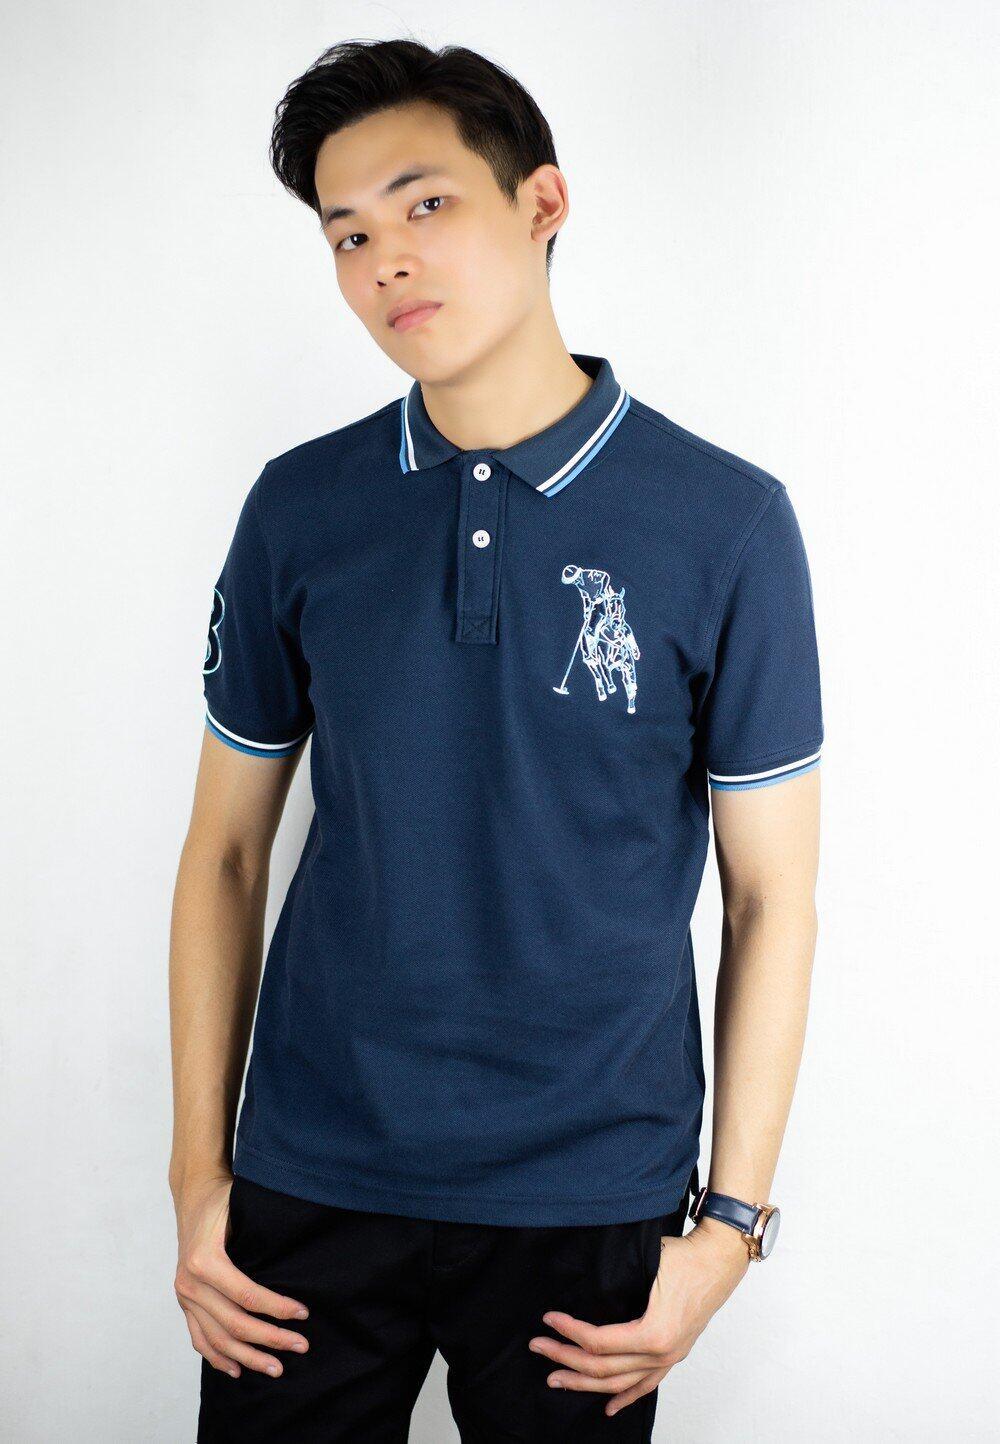 Polo Tee with Polo Embroidery 644